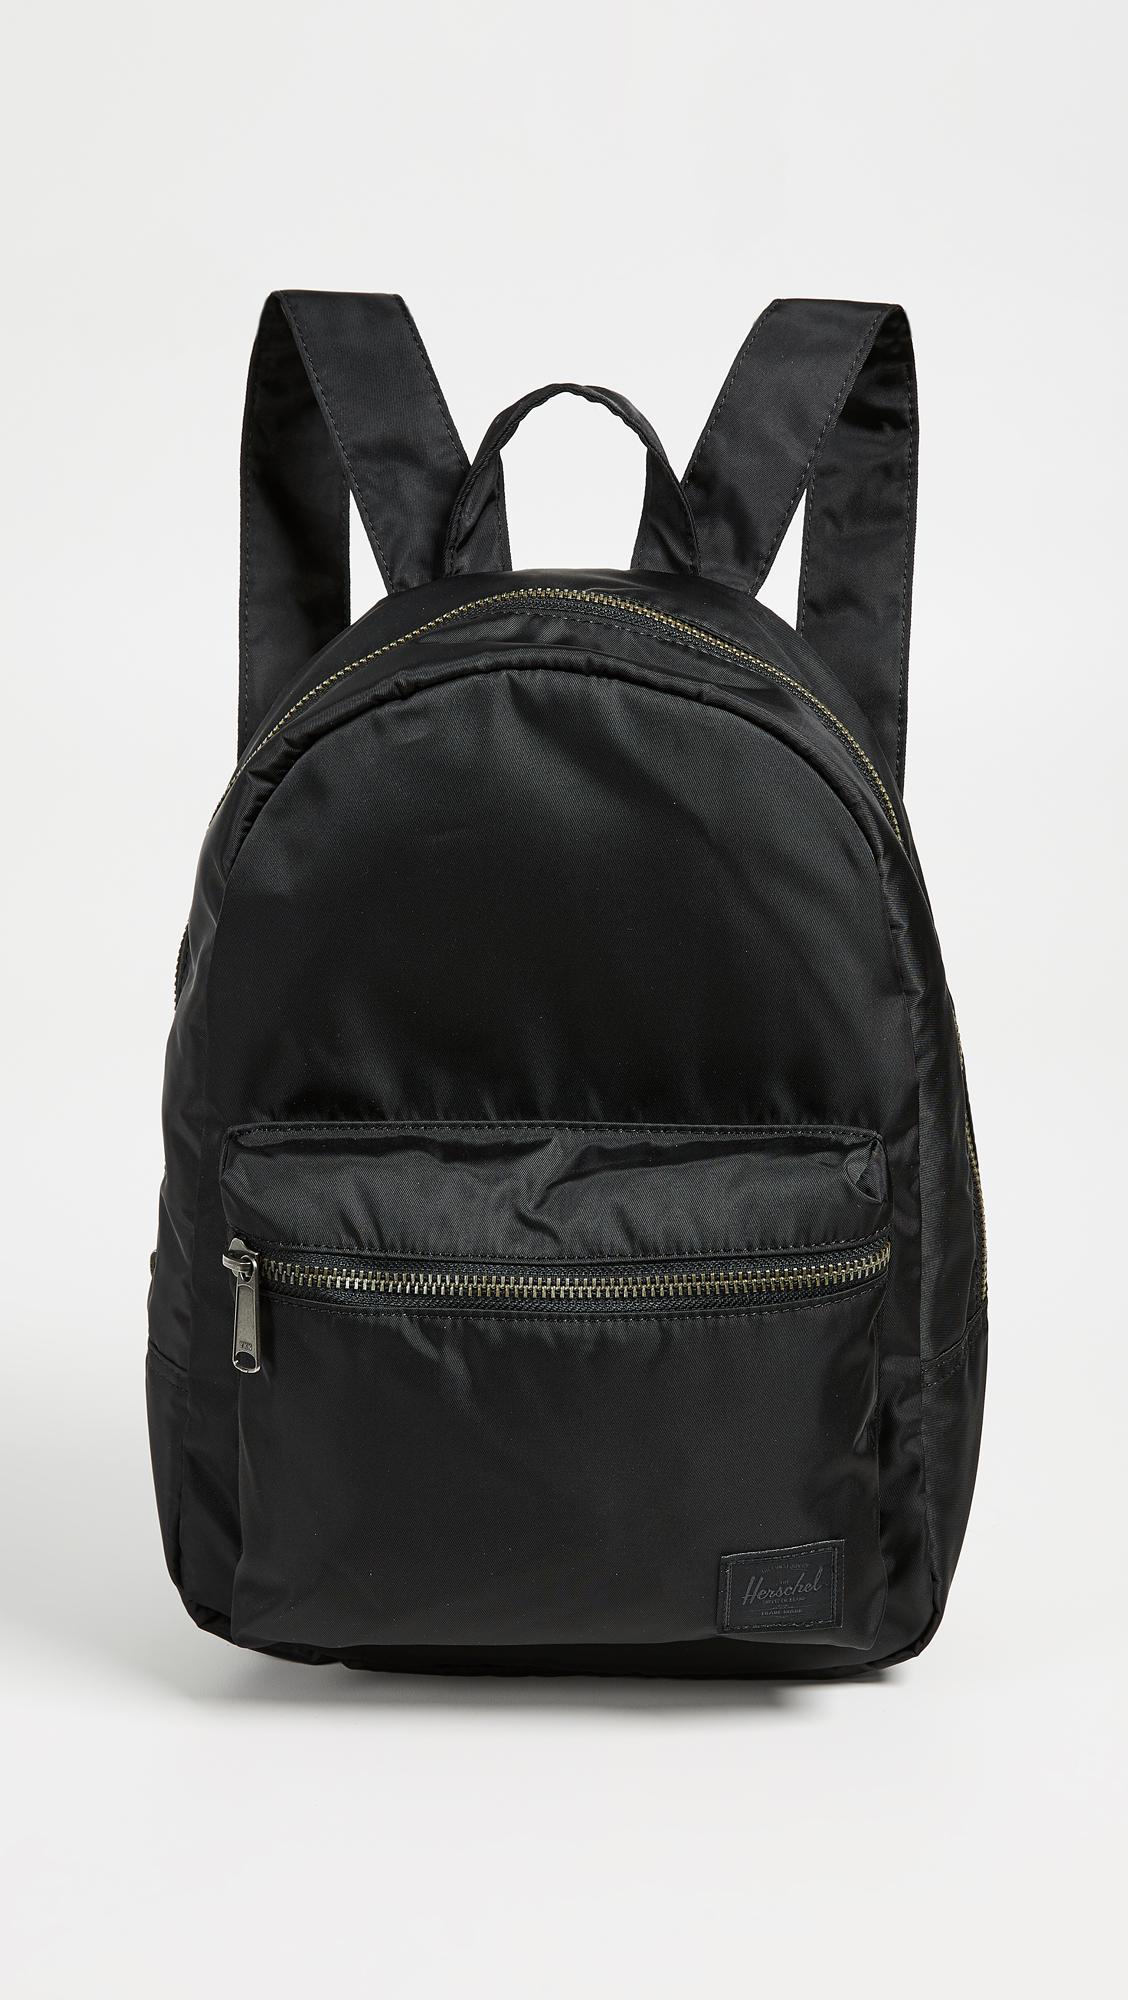 853841506ccf Lyst - Herschel Supply Co. Flight Satin Grove X Small Backpack in Black